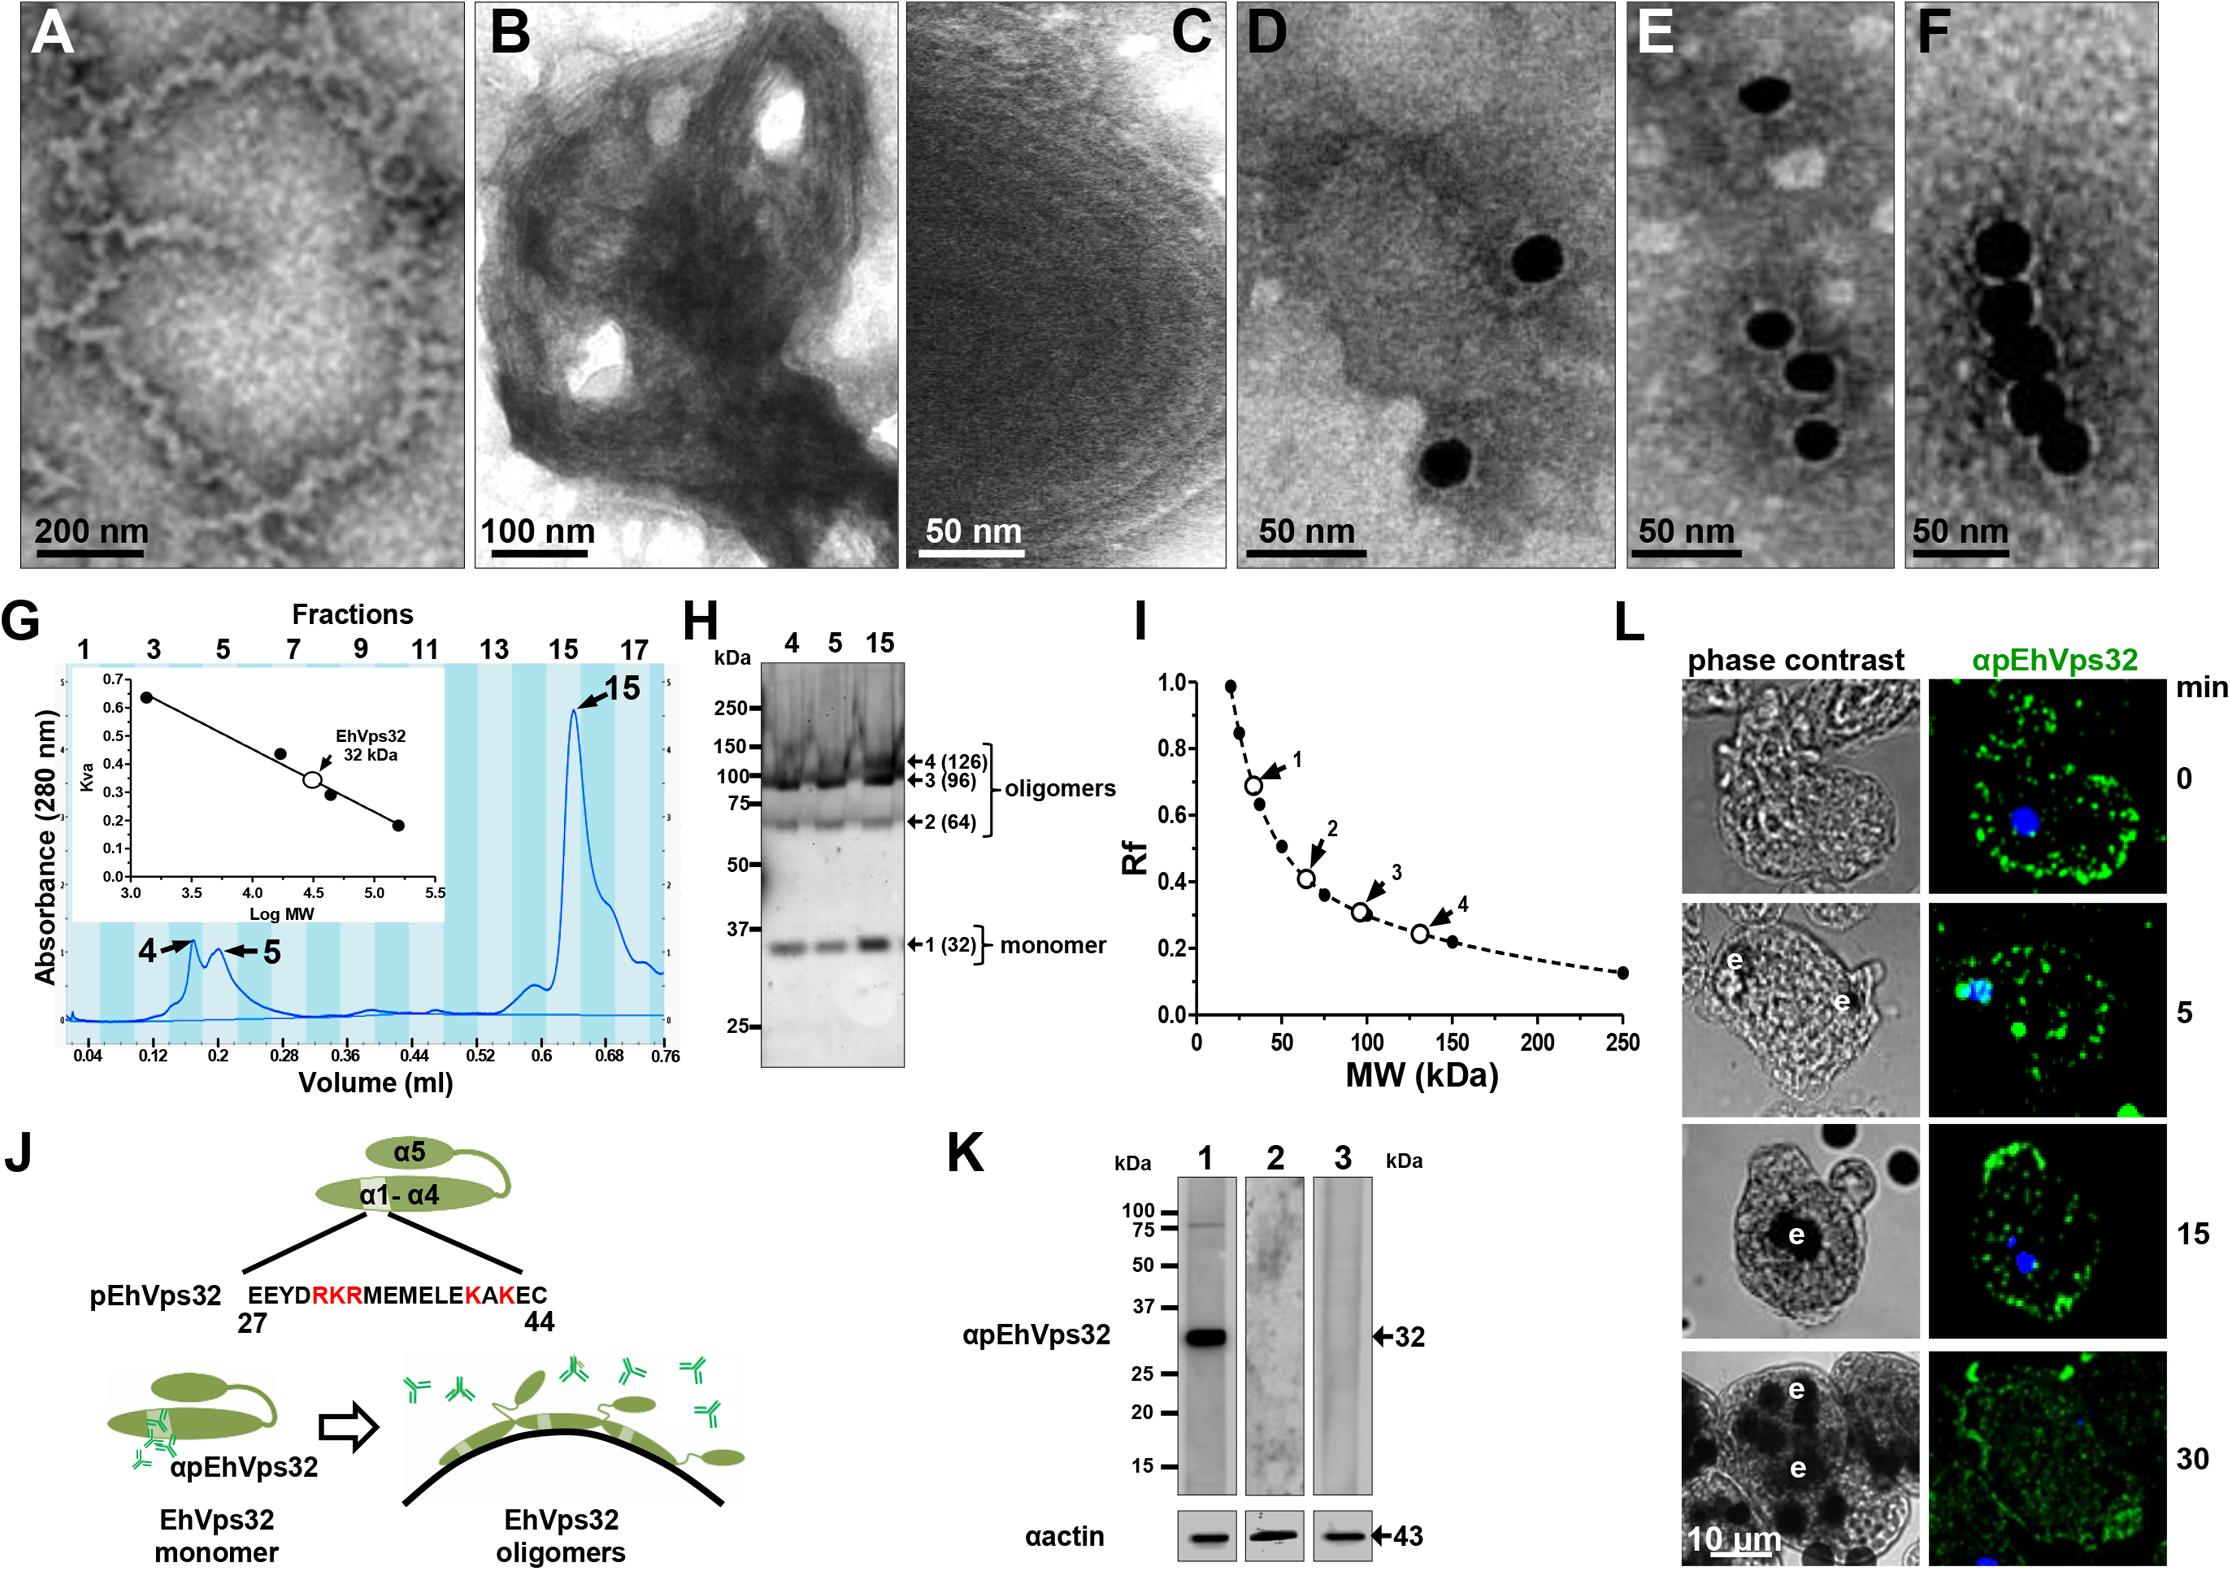 <i>In vitro</i> oligomerization of rEhVps32 and cellular localization of EhVps32 monomers.